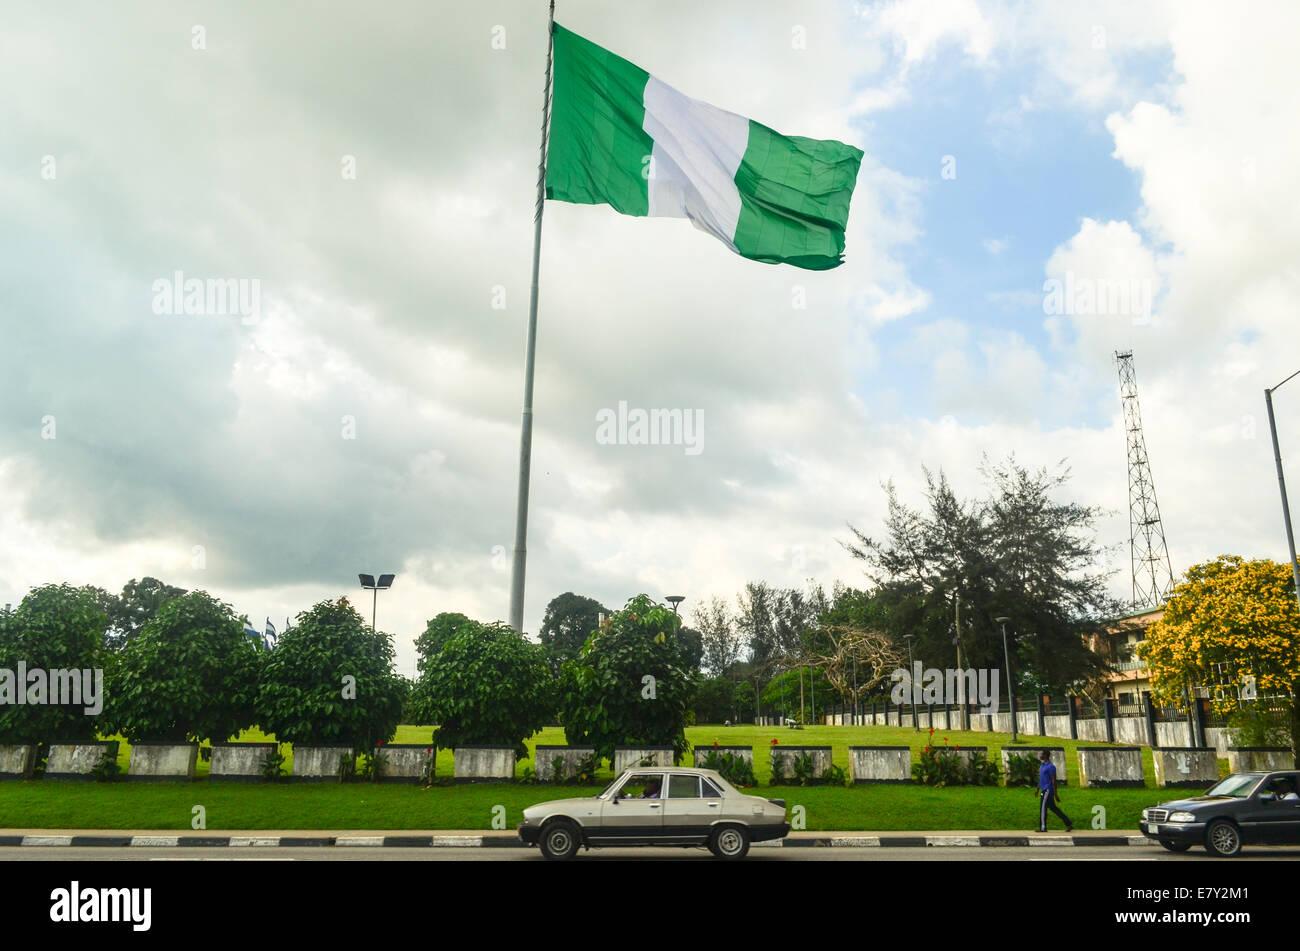 Big Nigerian flag in the wind of Calabar, Nigeria - Stock Image